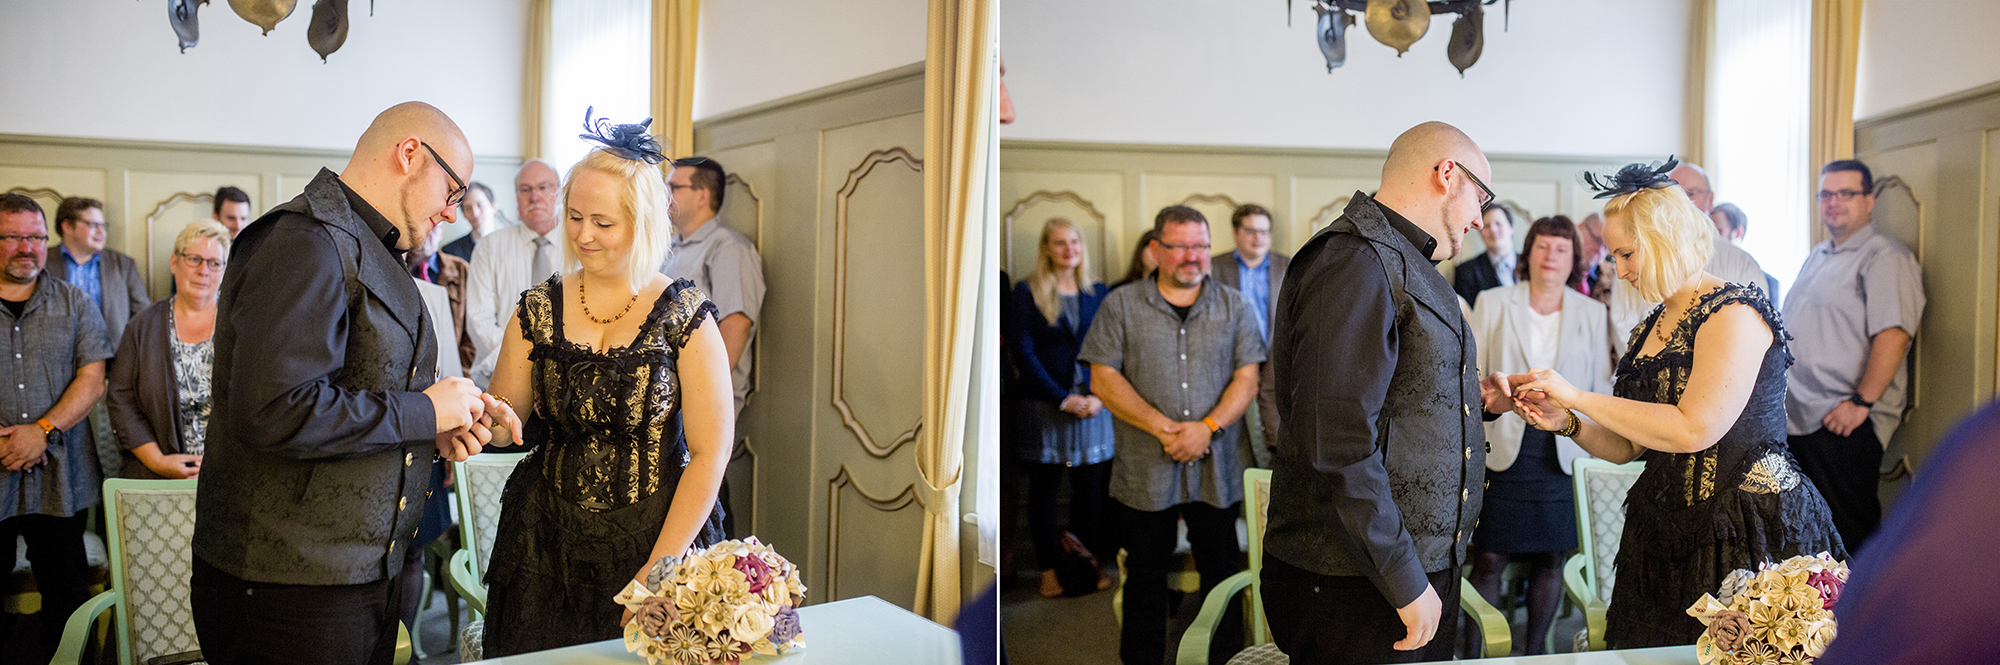 Seriously_Sabrina_Photography_Essen_Germany_RocknRoll_Hochzeit_Wedding_PatrickJenny35.jpg